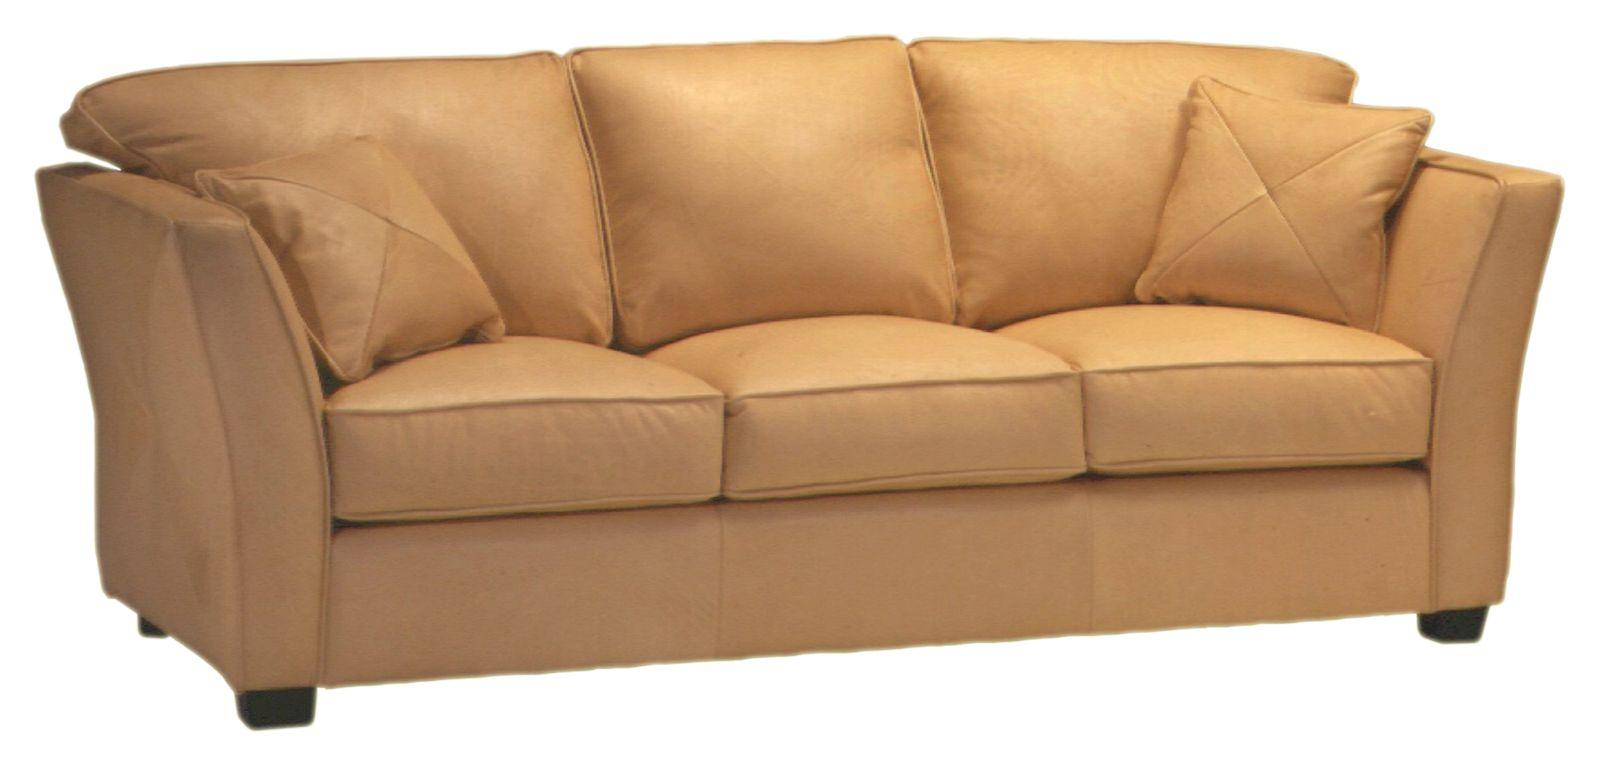 Omnia Leather Manhattan Chiar Leather Sleeper Sofa Sofa Best Leather Sofa